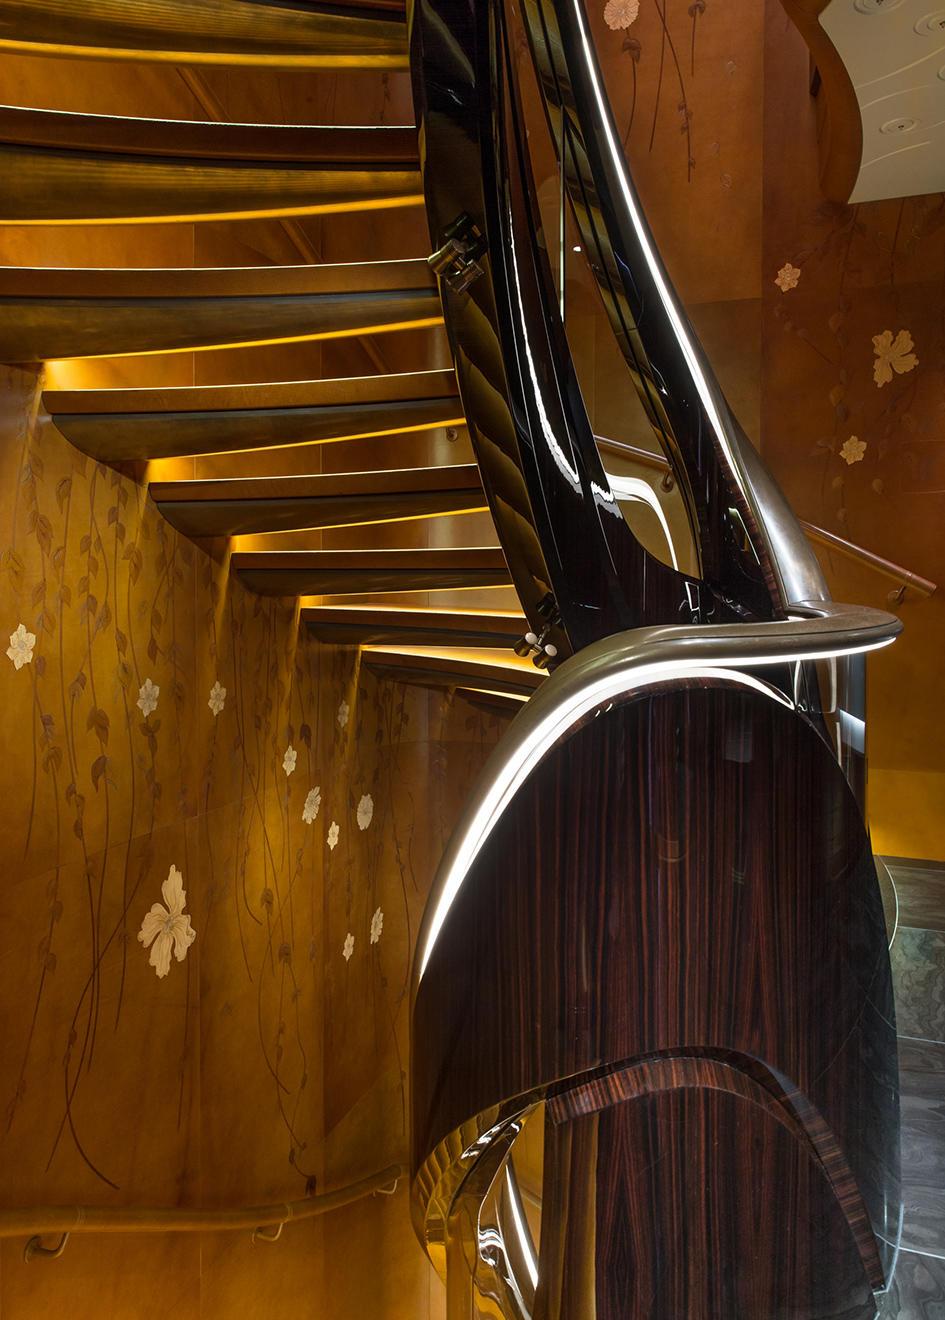 fjTlm82QMOuUQYJiE28Z_Kismet-super-yacht-lurssen-shahid-khan-95-metres-credit-guillaume-plisson-stair